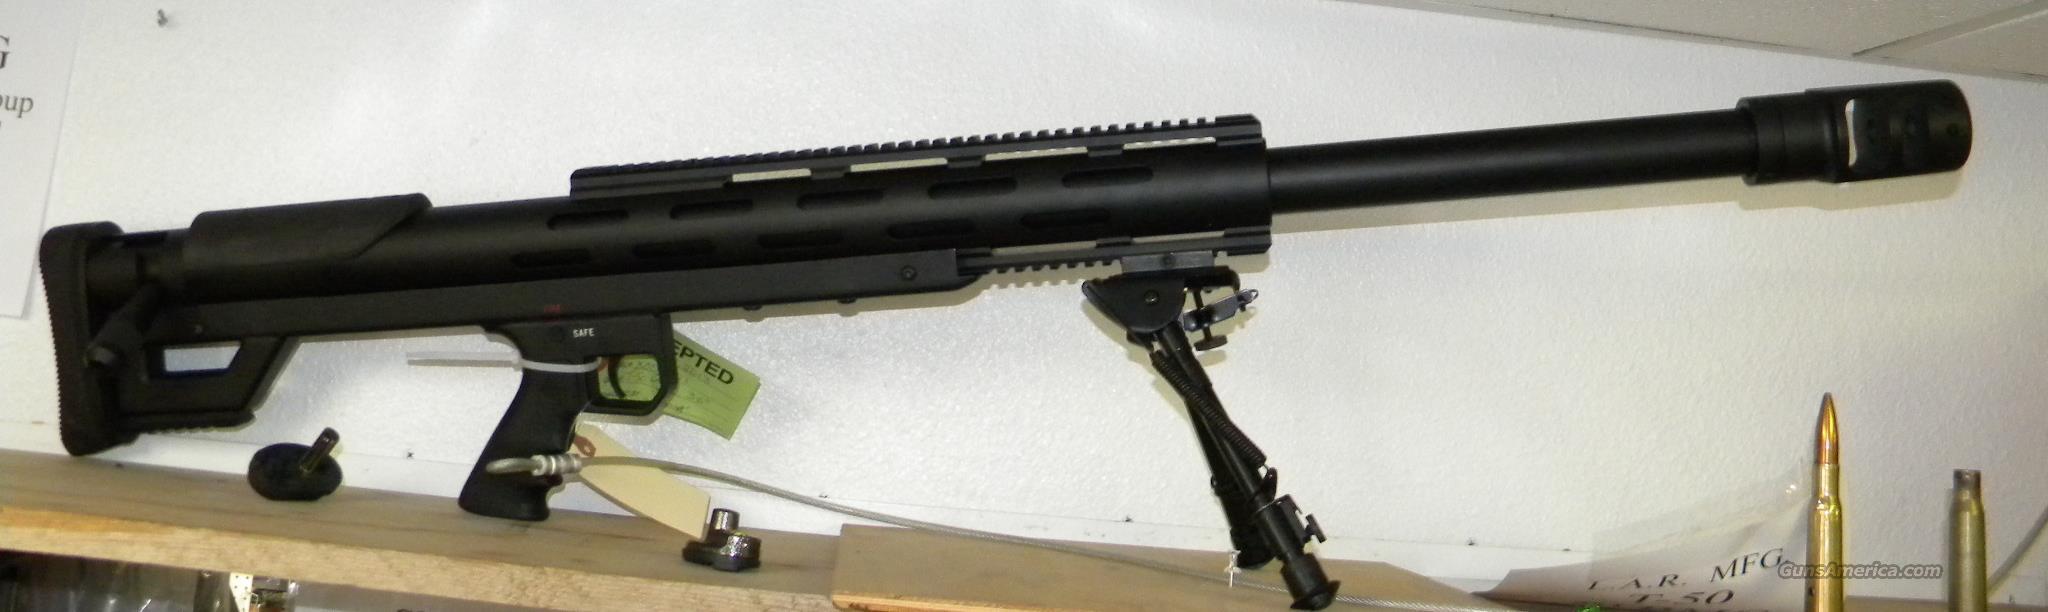 Lar T 50 50 Bmg Single Shot Rifle For Sale